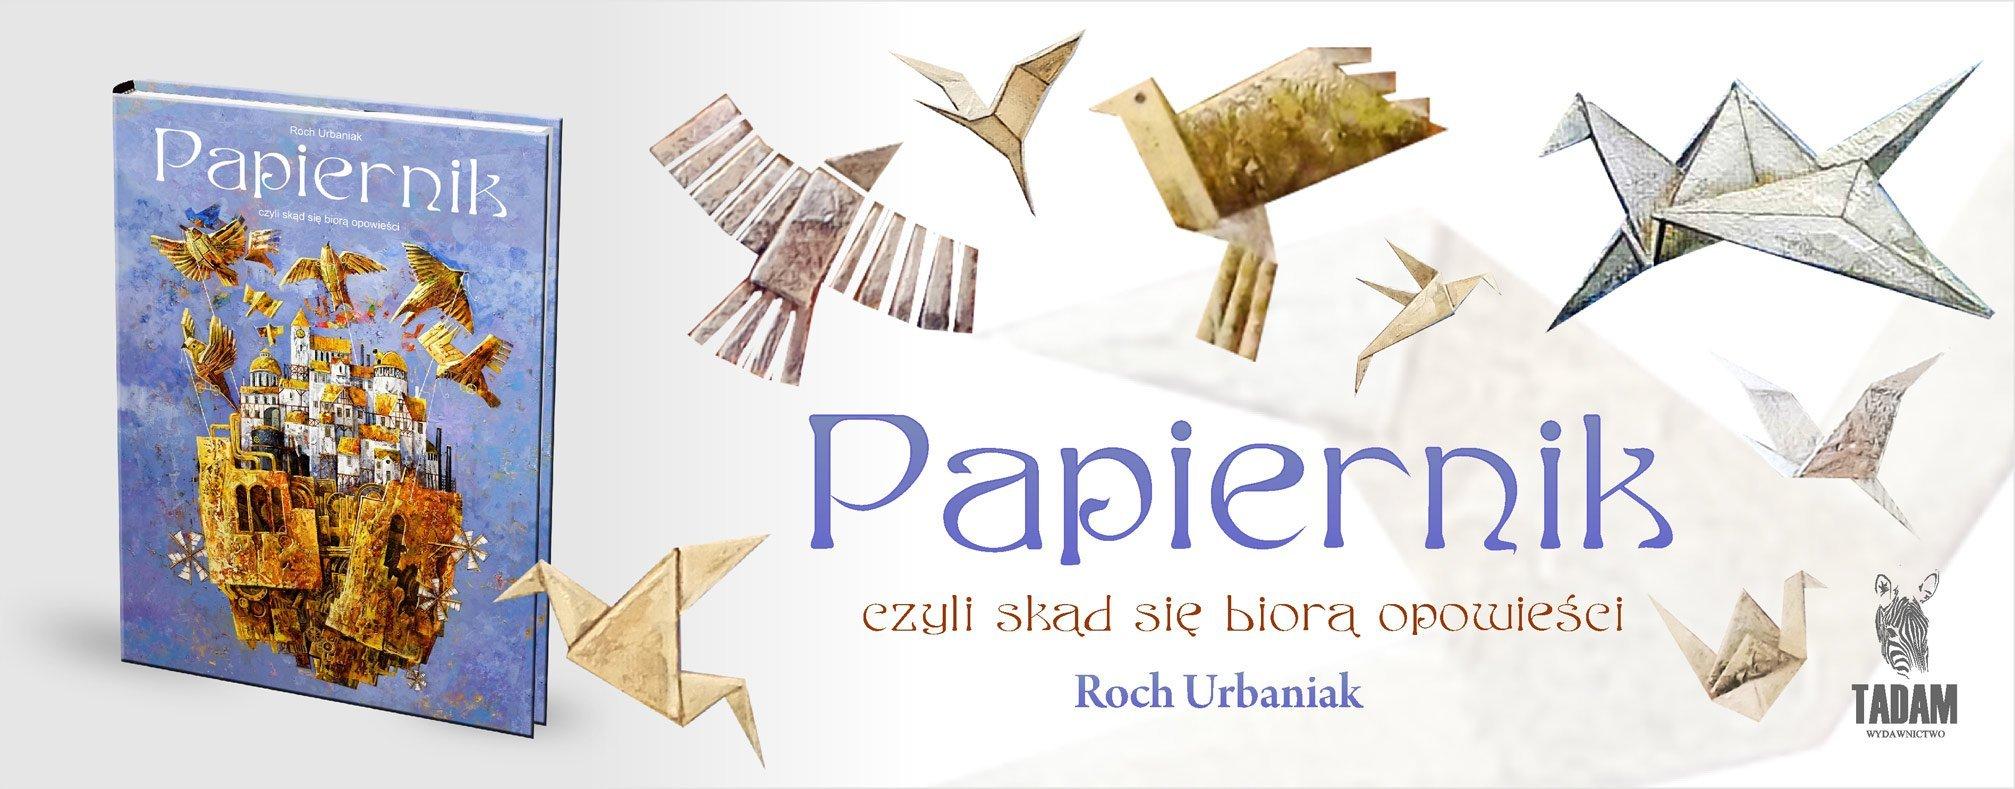 Papiernik premiera książki